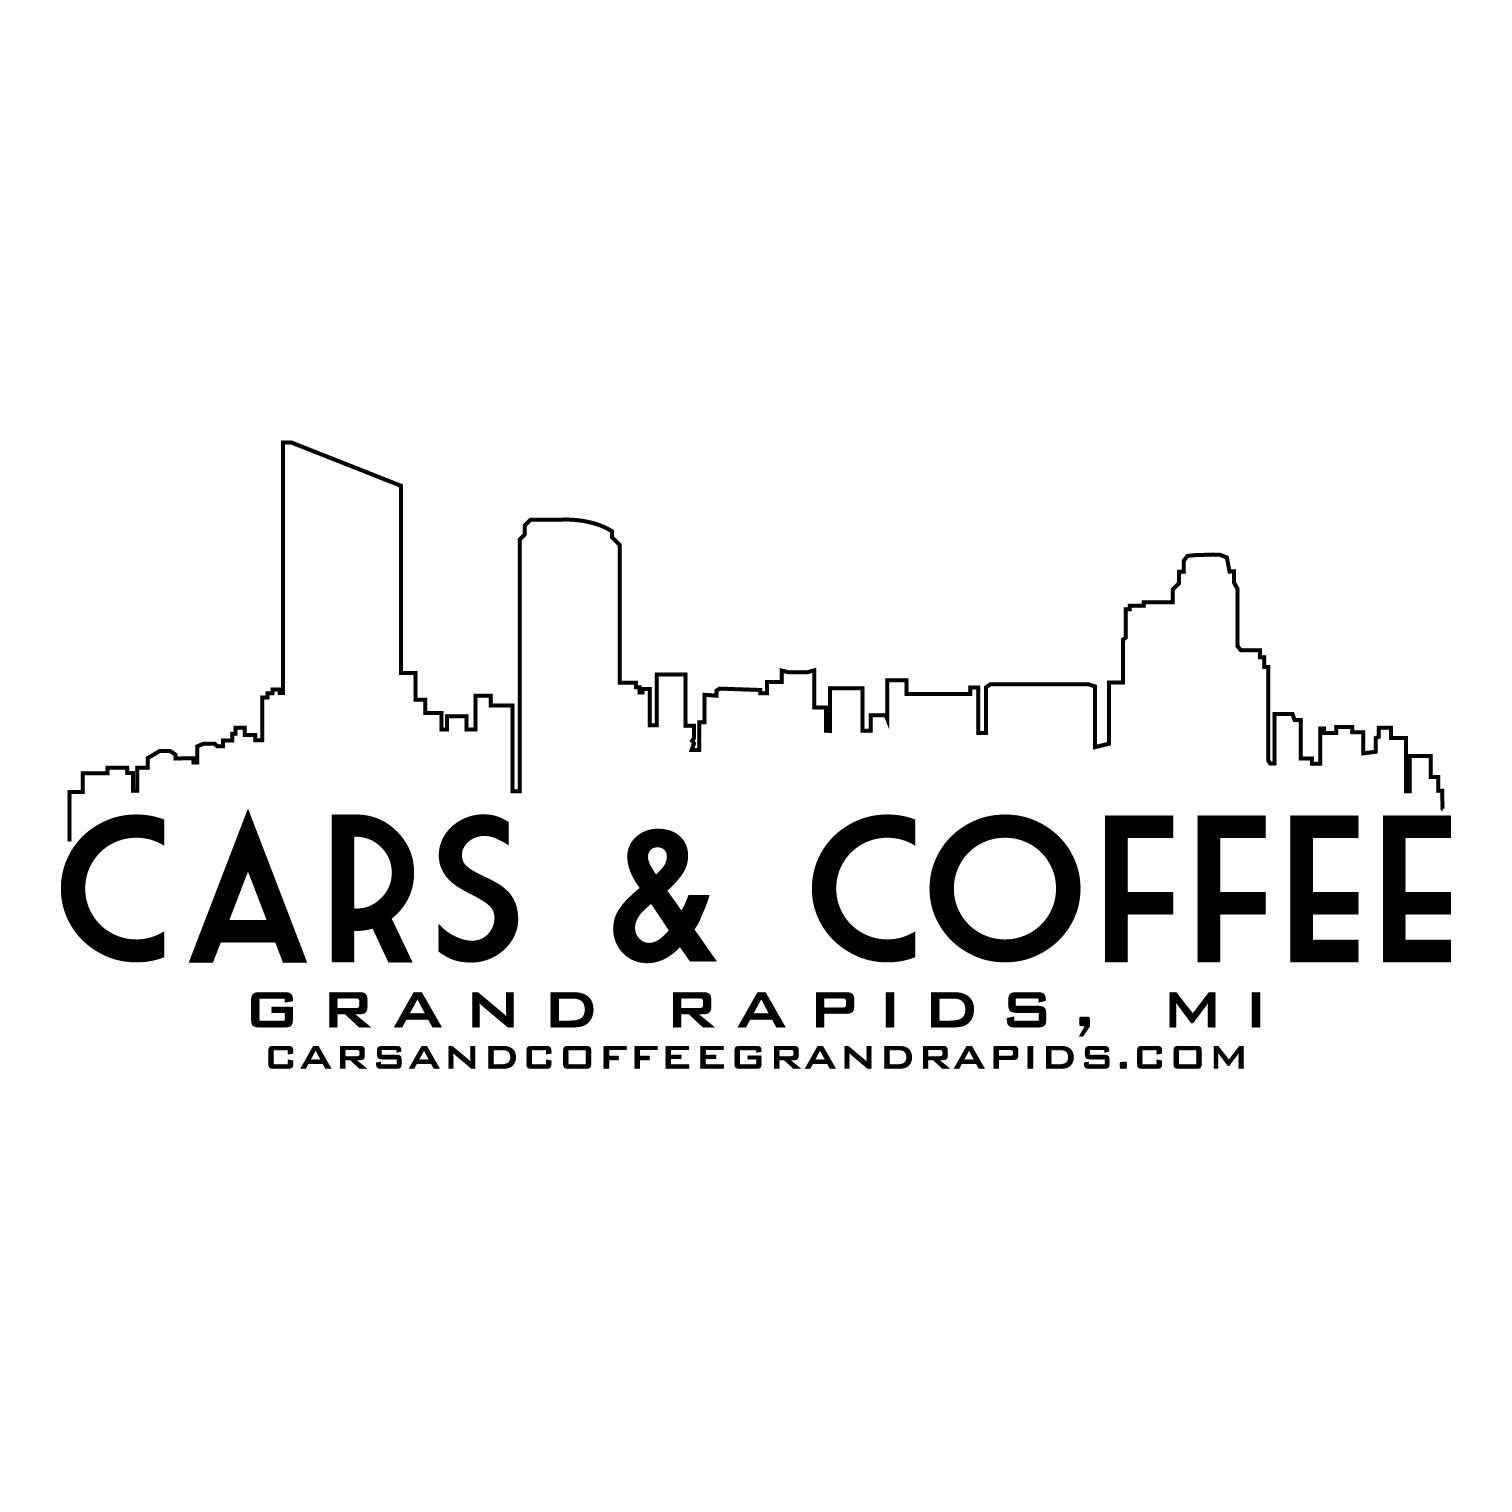 Cars & Coffee Grand Rapids